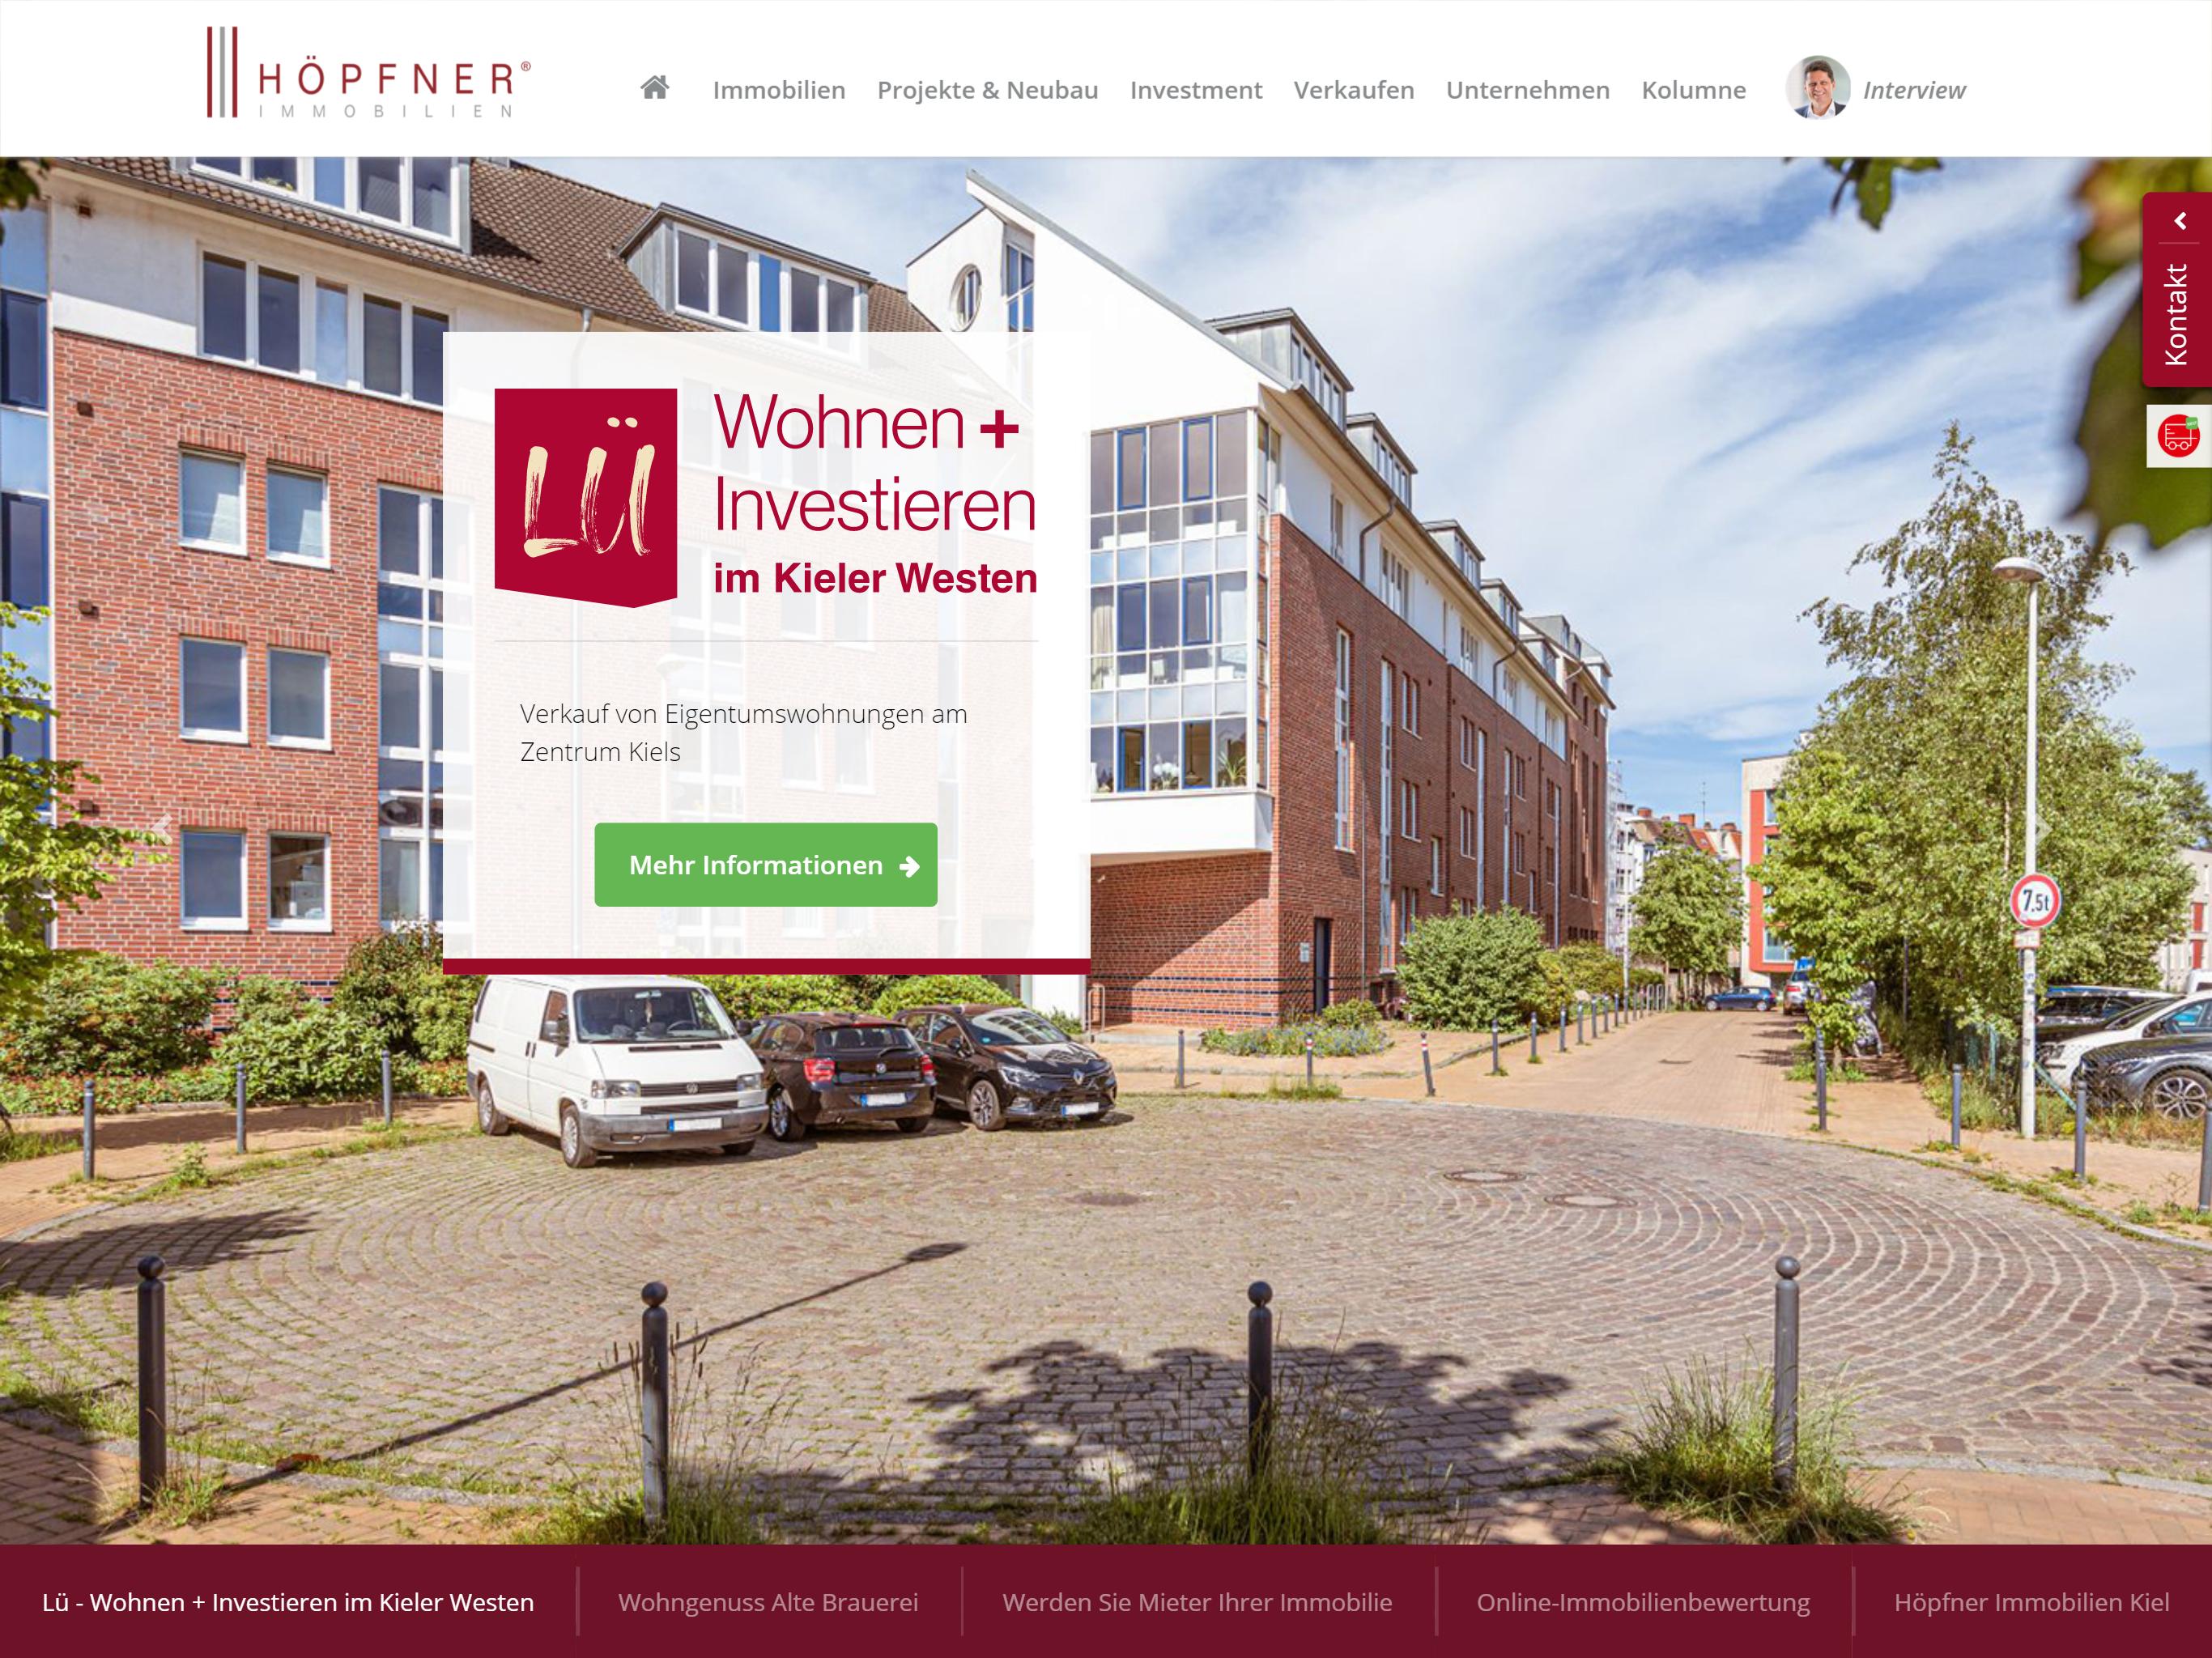 www.hoepfnerimmobilien.de